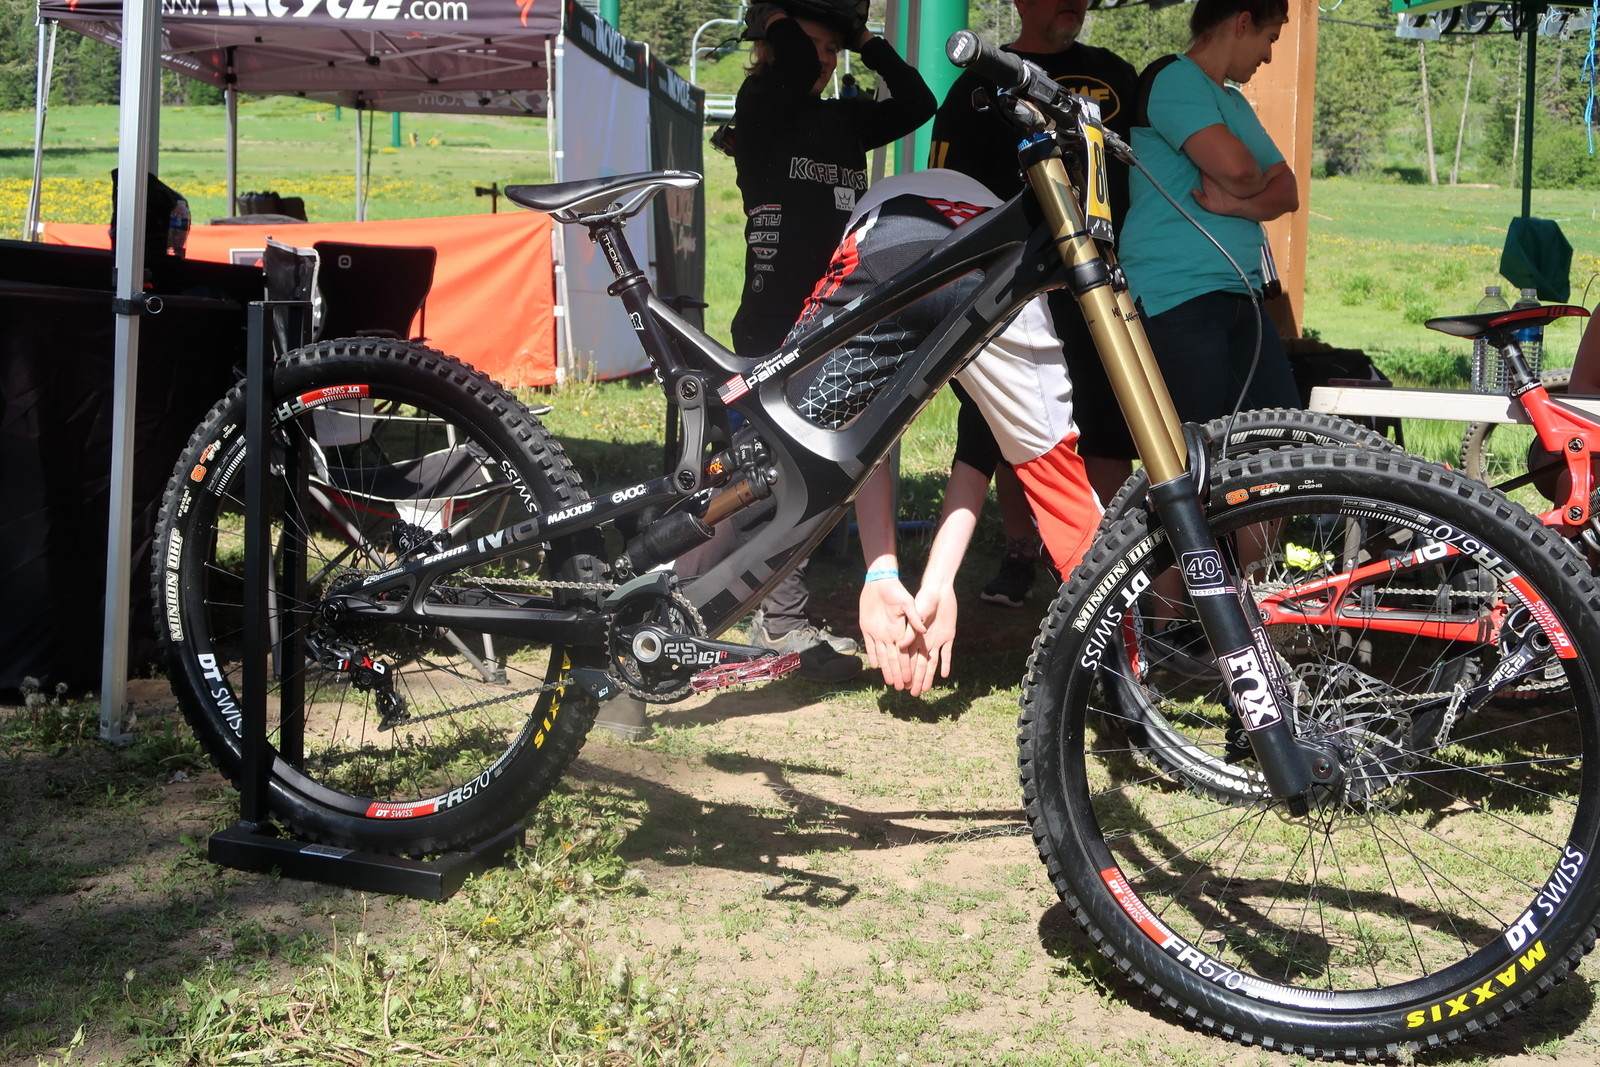 Shaun Palmer's Intense M16 for Damon Bradshaw - PIT BITS - Tamarack Pro GRT / NW Cup - Mountain Biking Pictures - Vital MTB